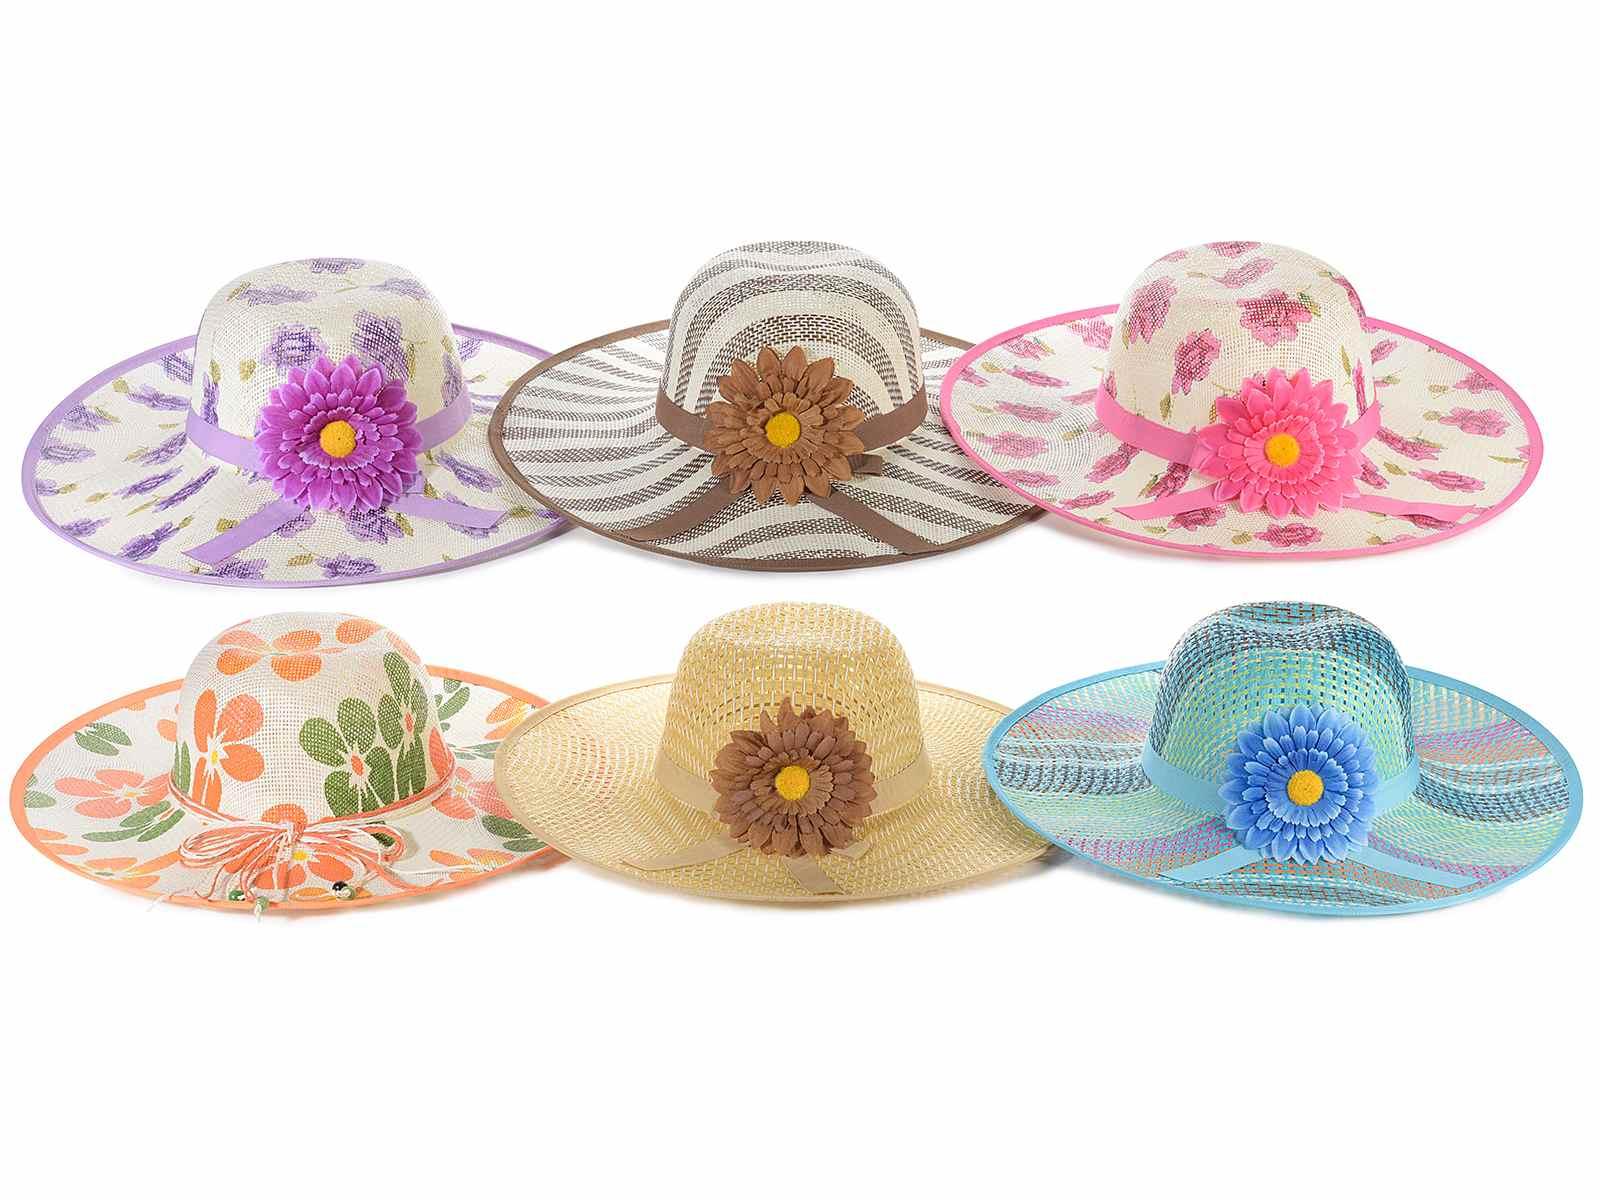 Sombreros de playa para mujeres (12.13.71) - Art From Italy c3789ec3b70